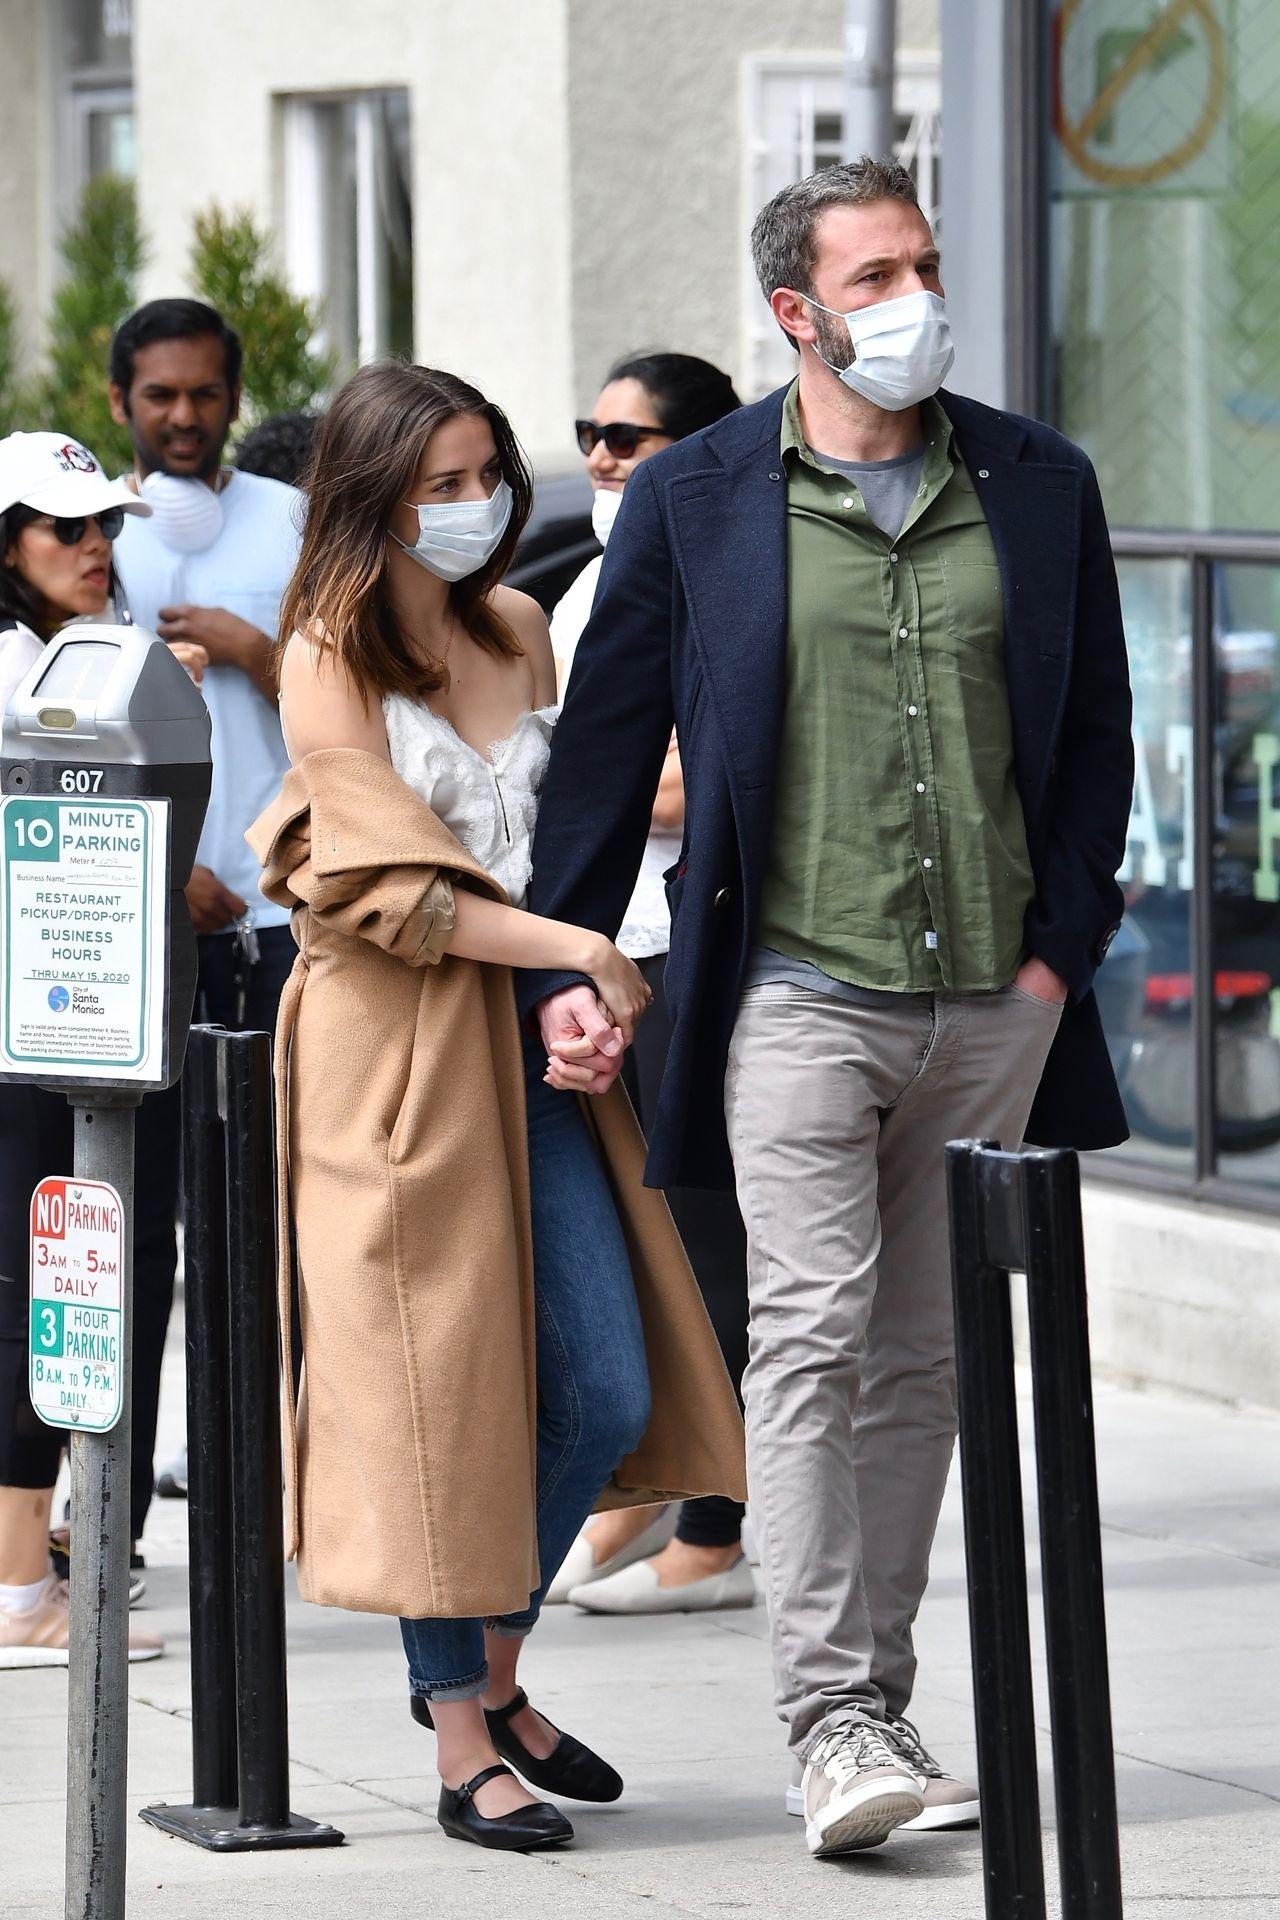 Zakochani Ben Affleck i Ana de Armas w maseczkach